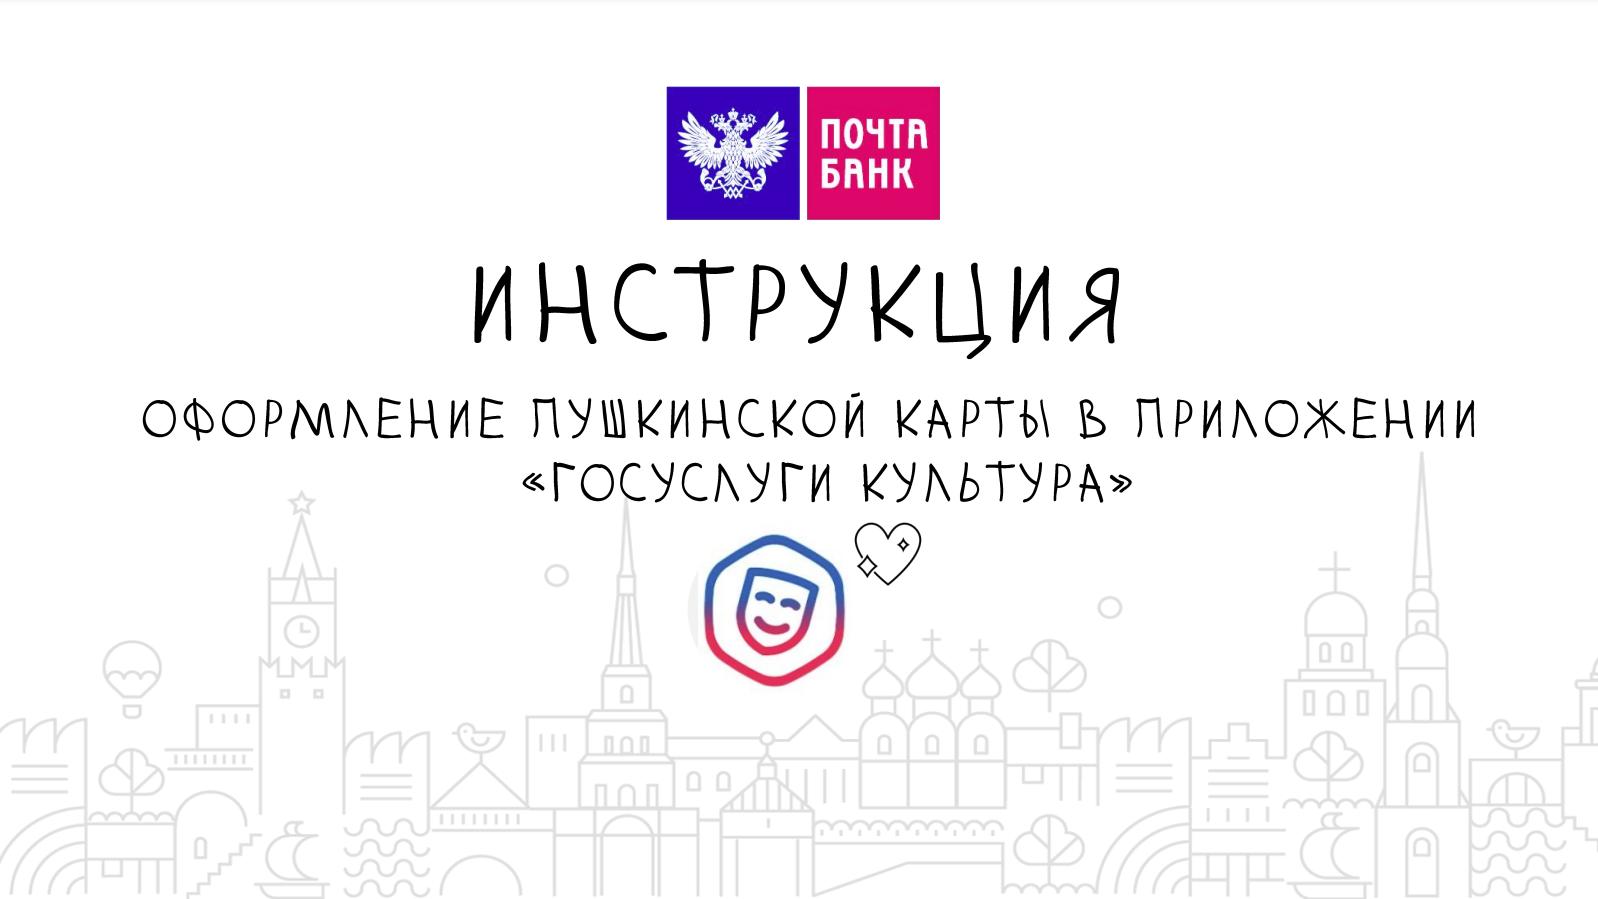 Пушкинская карта - 09-09-2021-2